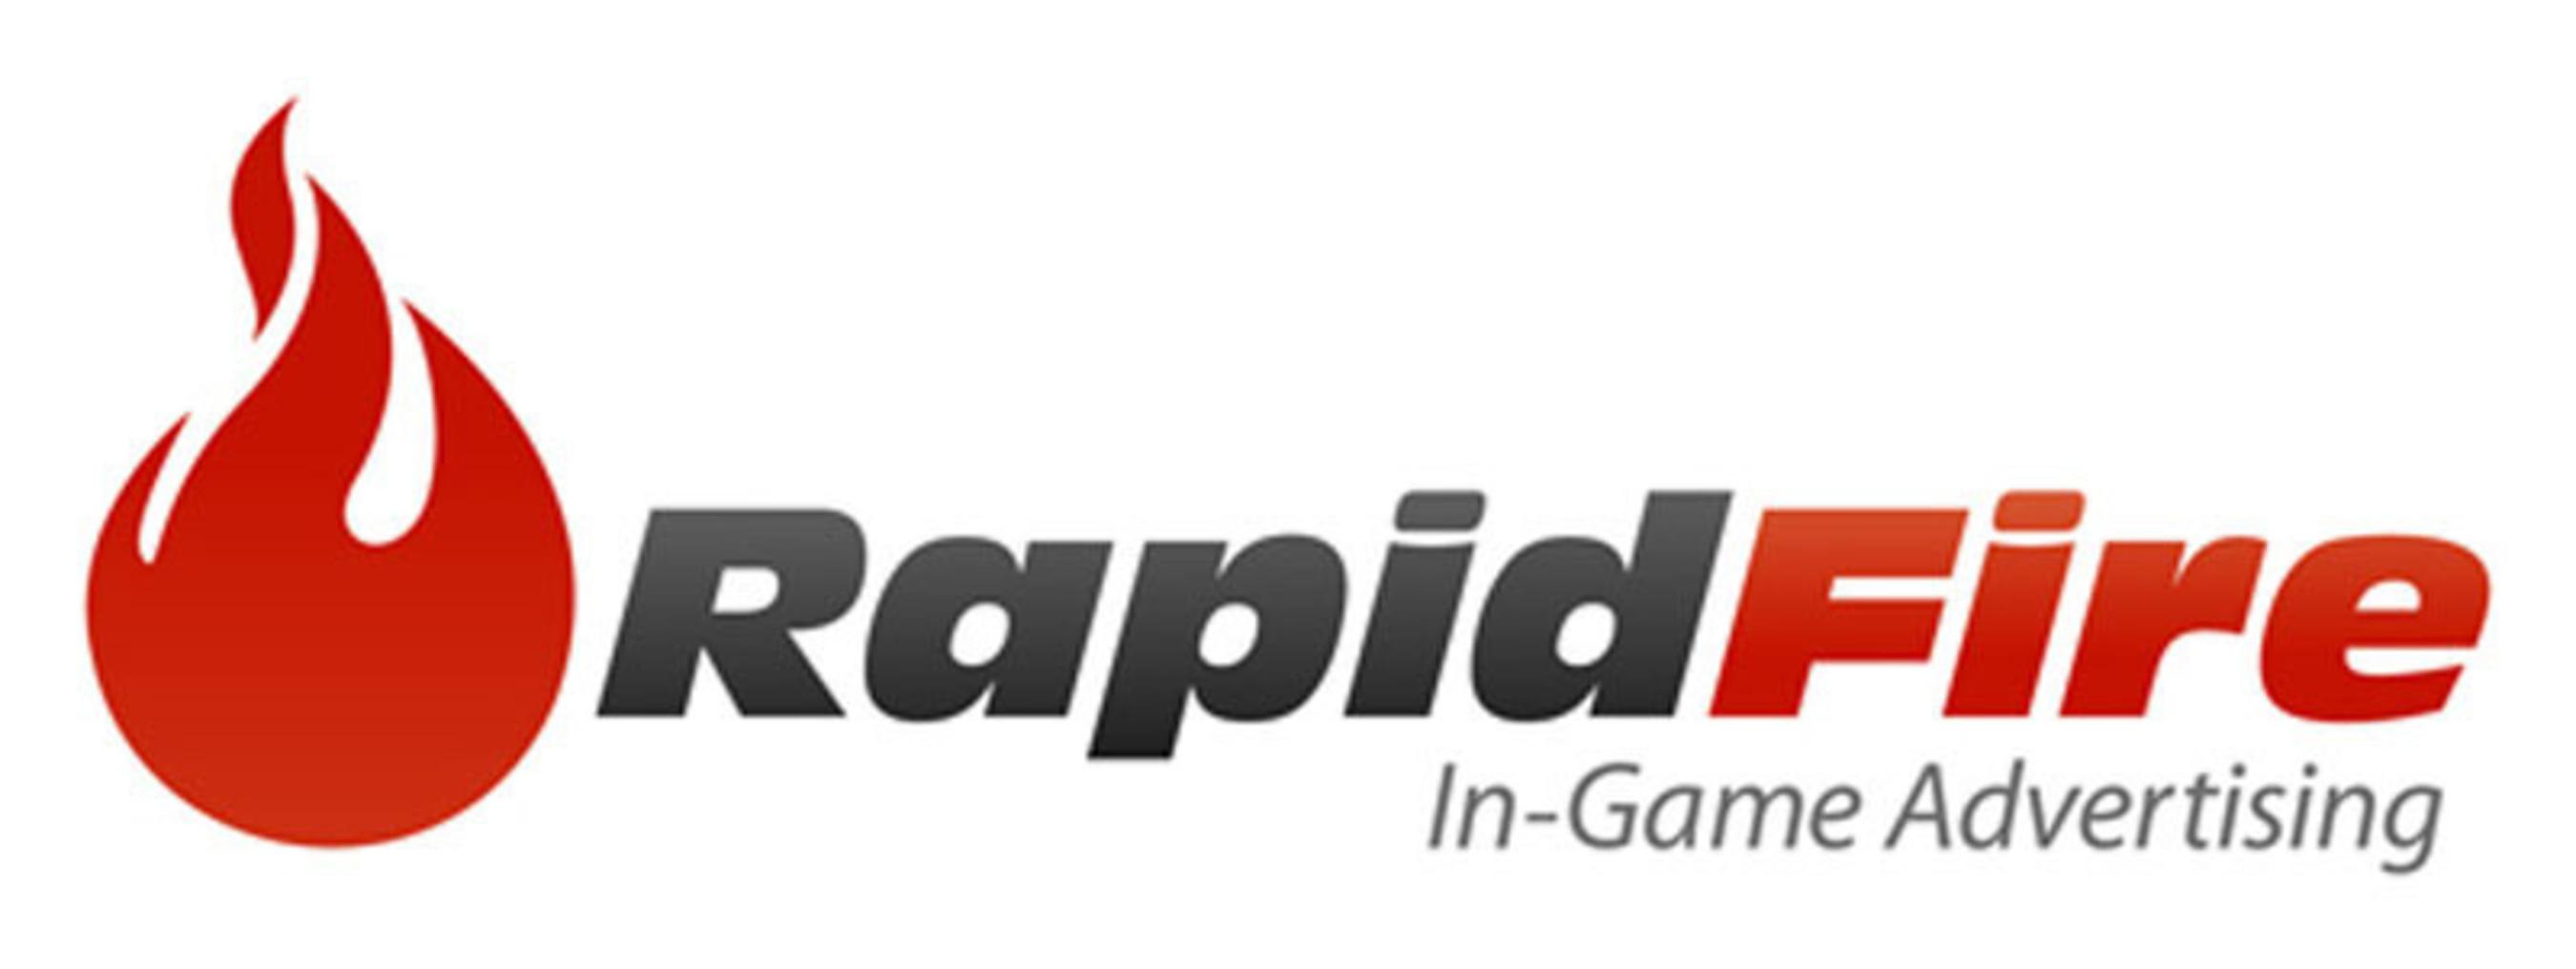 RapidFire. (PRNewsFoto/RapidFire) (PRNewsFoto/RAPIDFIRE)